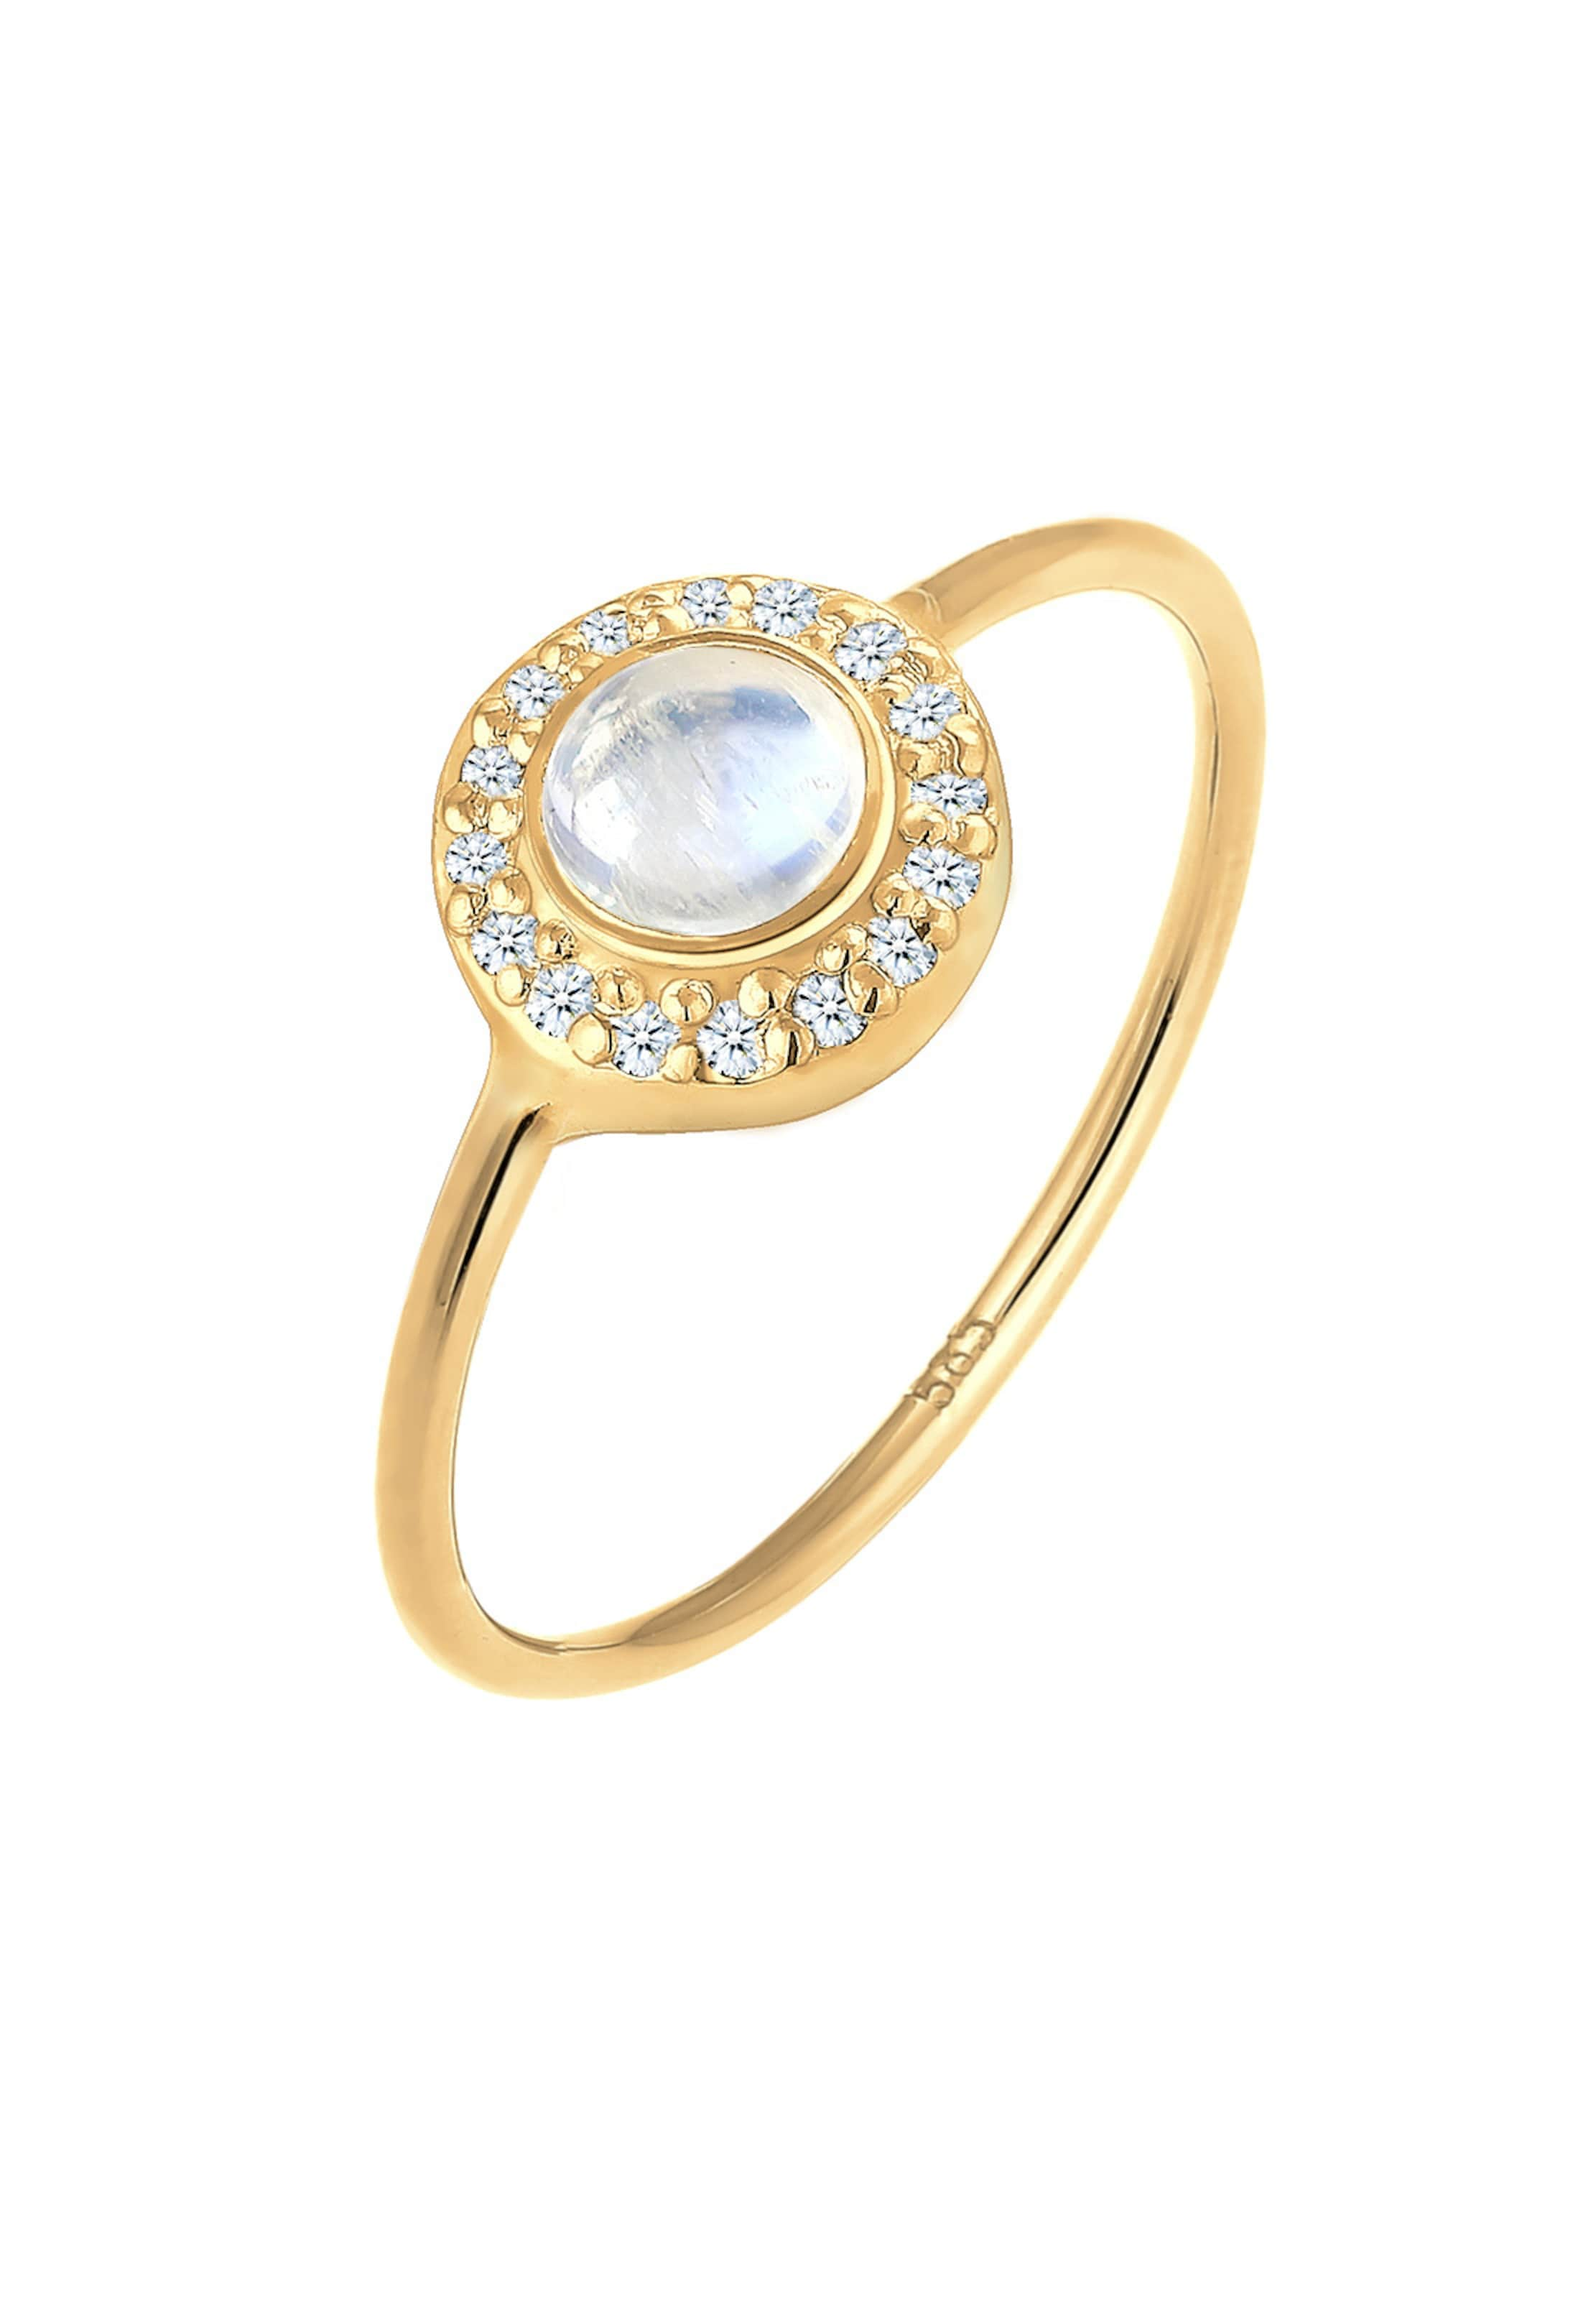 In In Premium GoldWeiß Elli Ring Elli Premium Ring Elli GoldWeiß kZuXiP